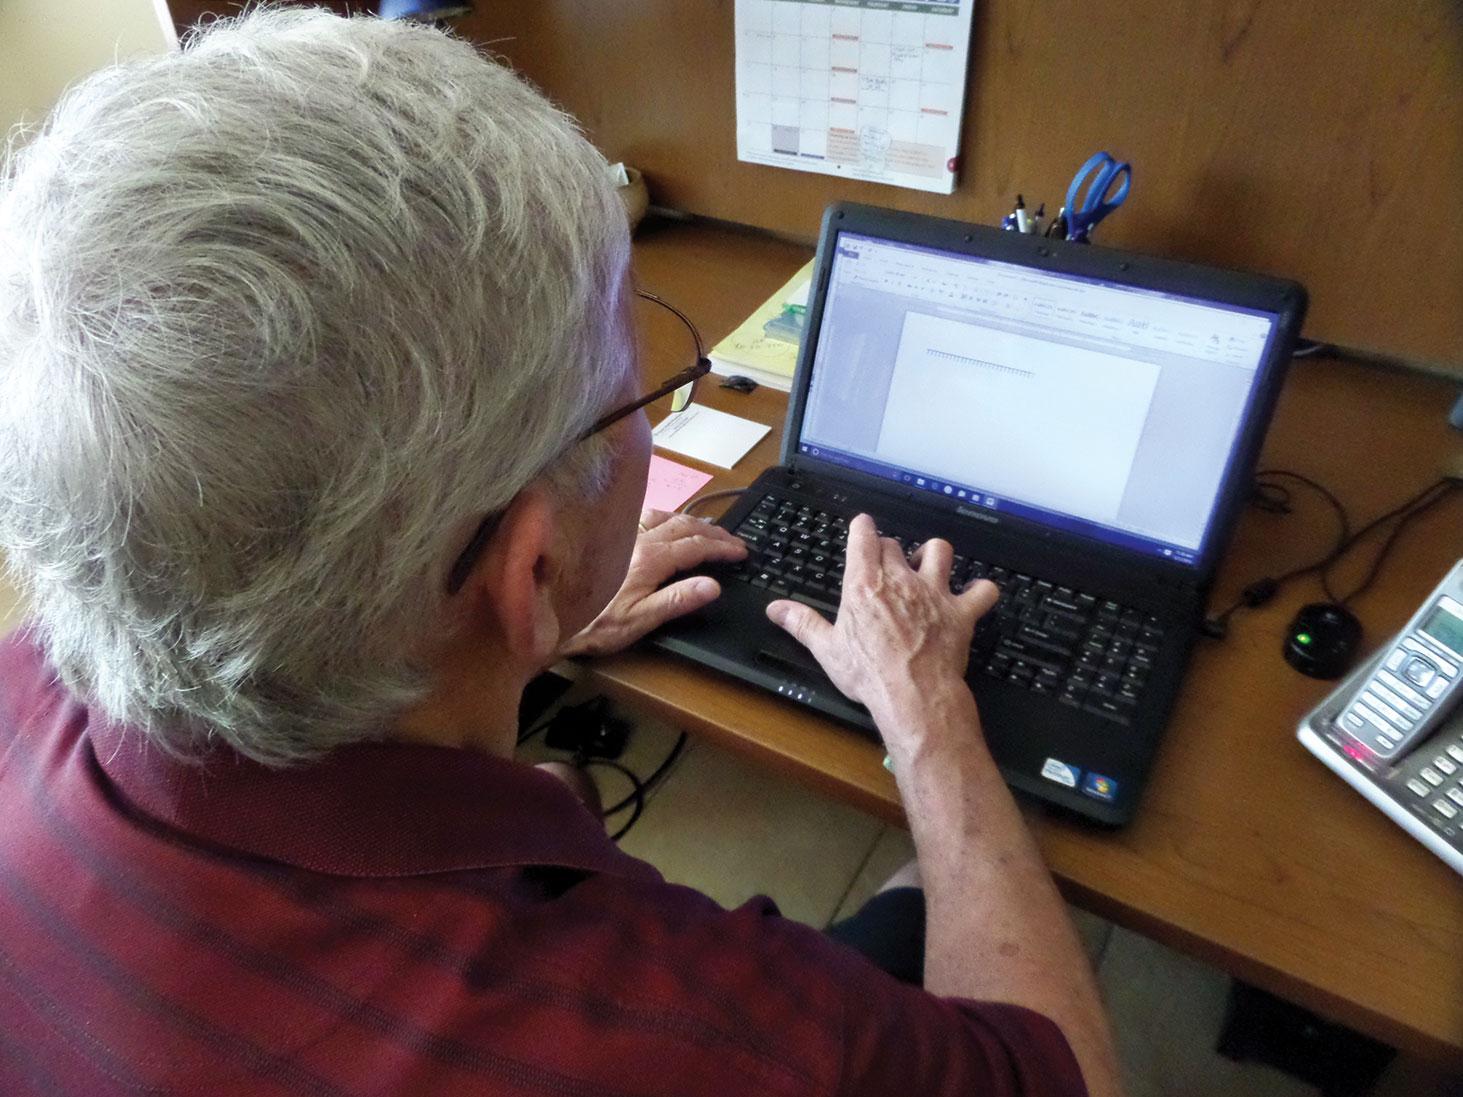 Enthusiastic storyteller writes